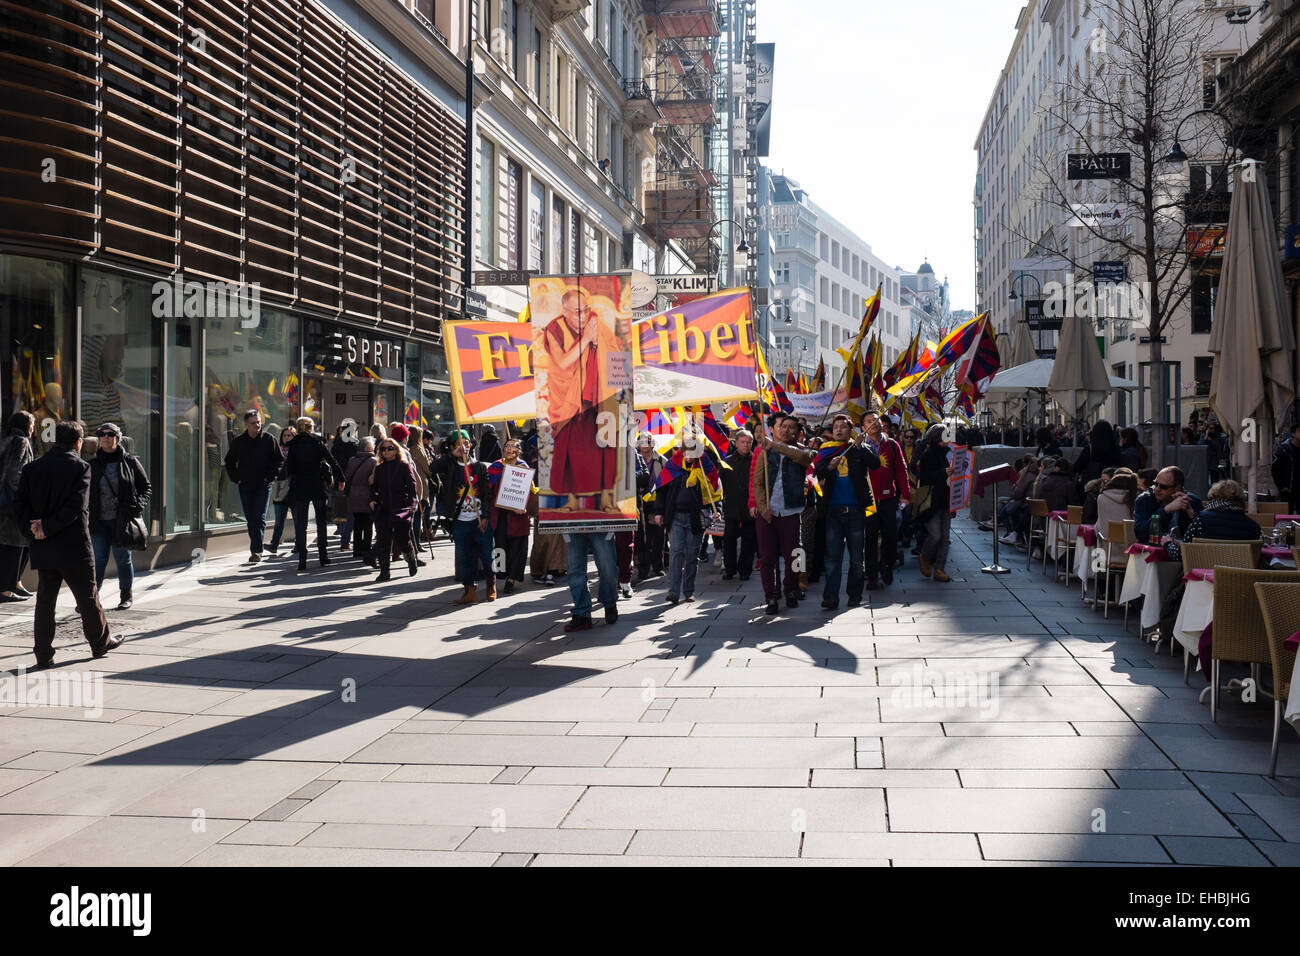 Vienna, kärntnerstrasse, 03/10/2015. A demonstration for Free Tibet - Stock Image